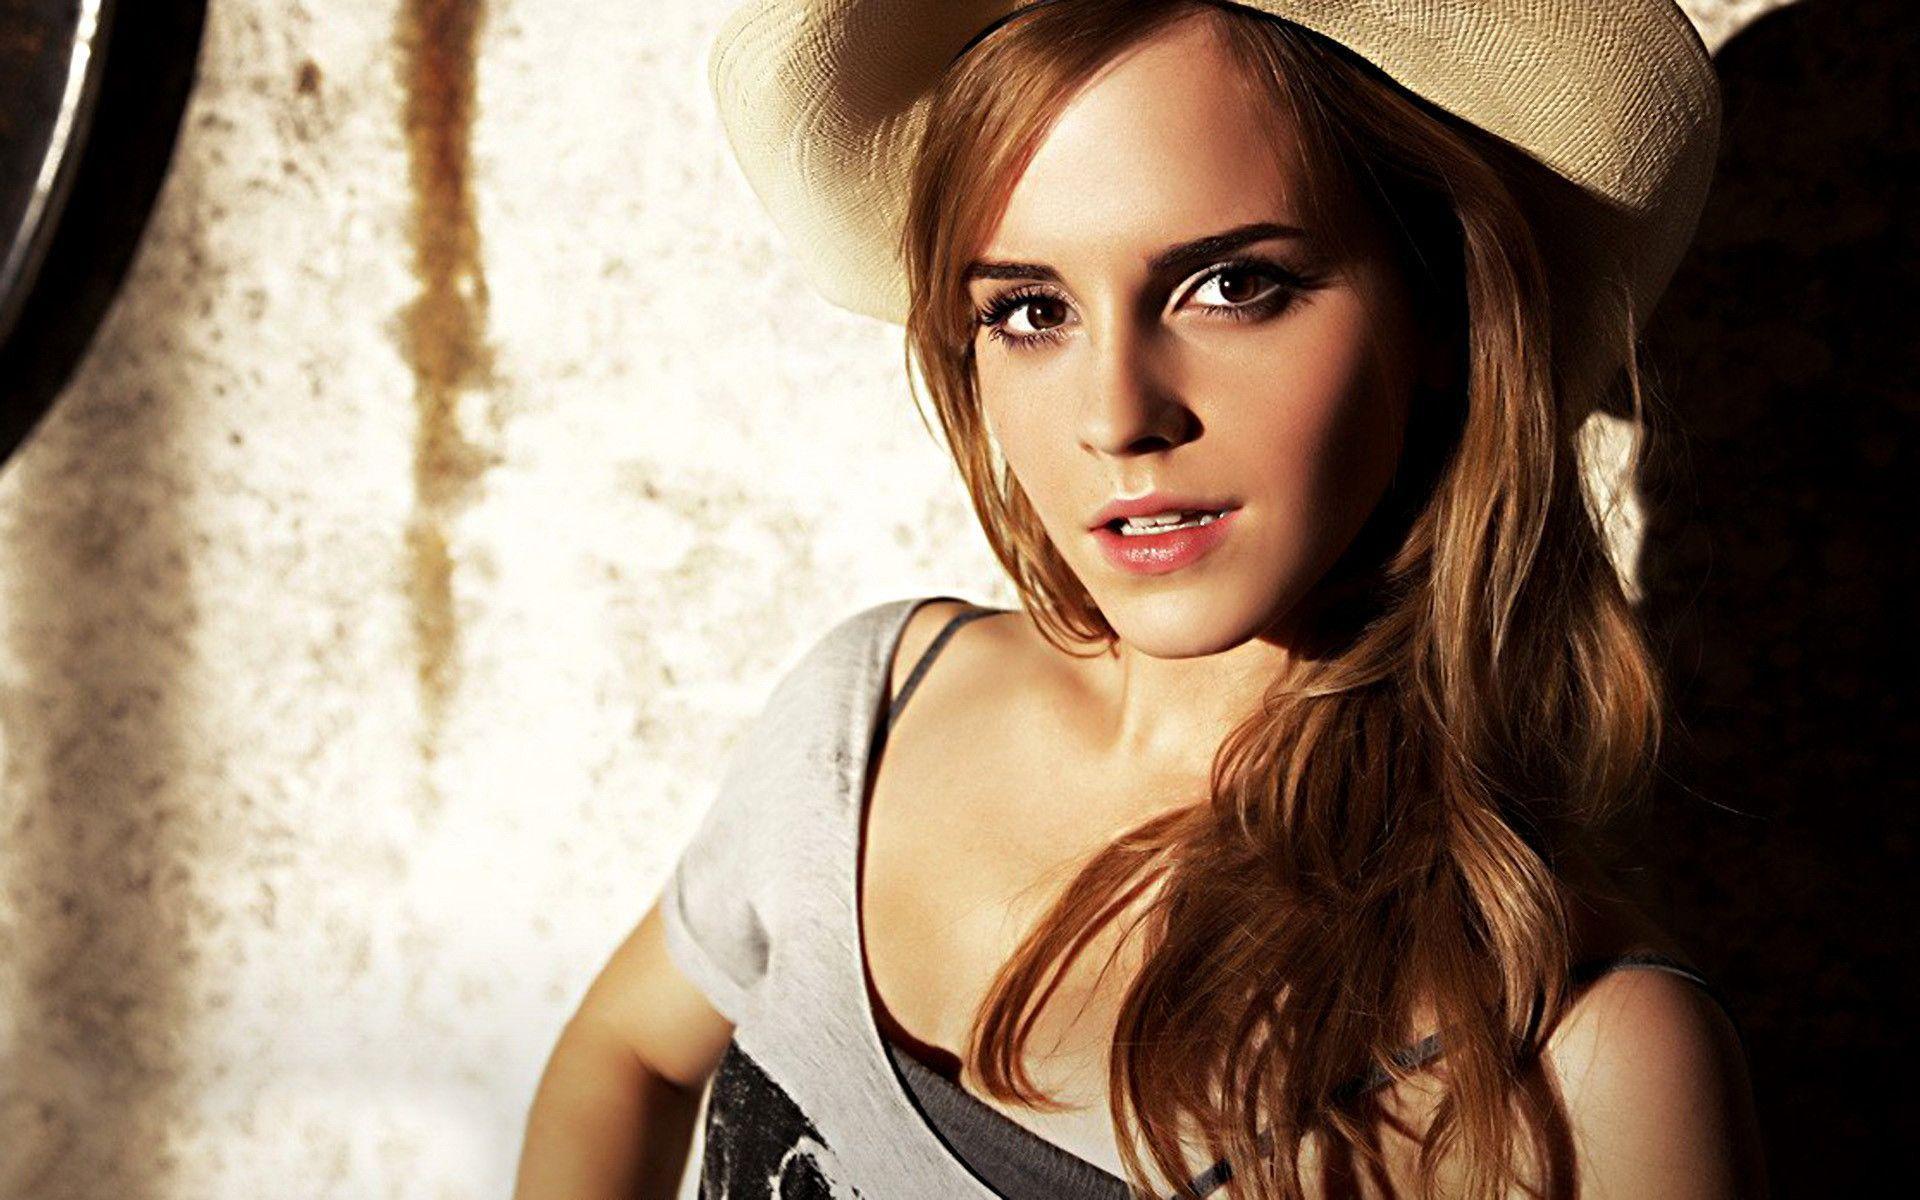 Emma Watson Computer Wallpapers, Desktop Backgrounds 1920x1200 Id ...